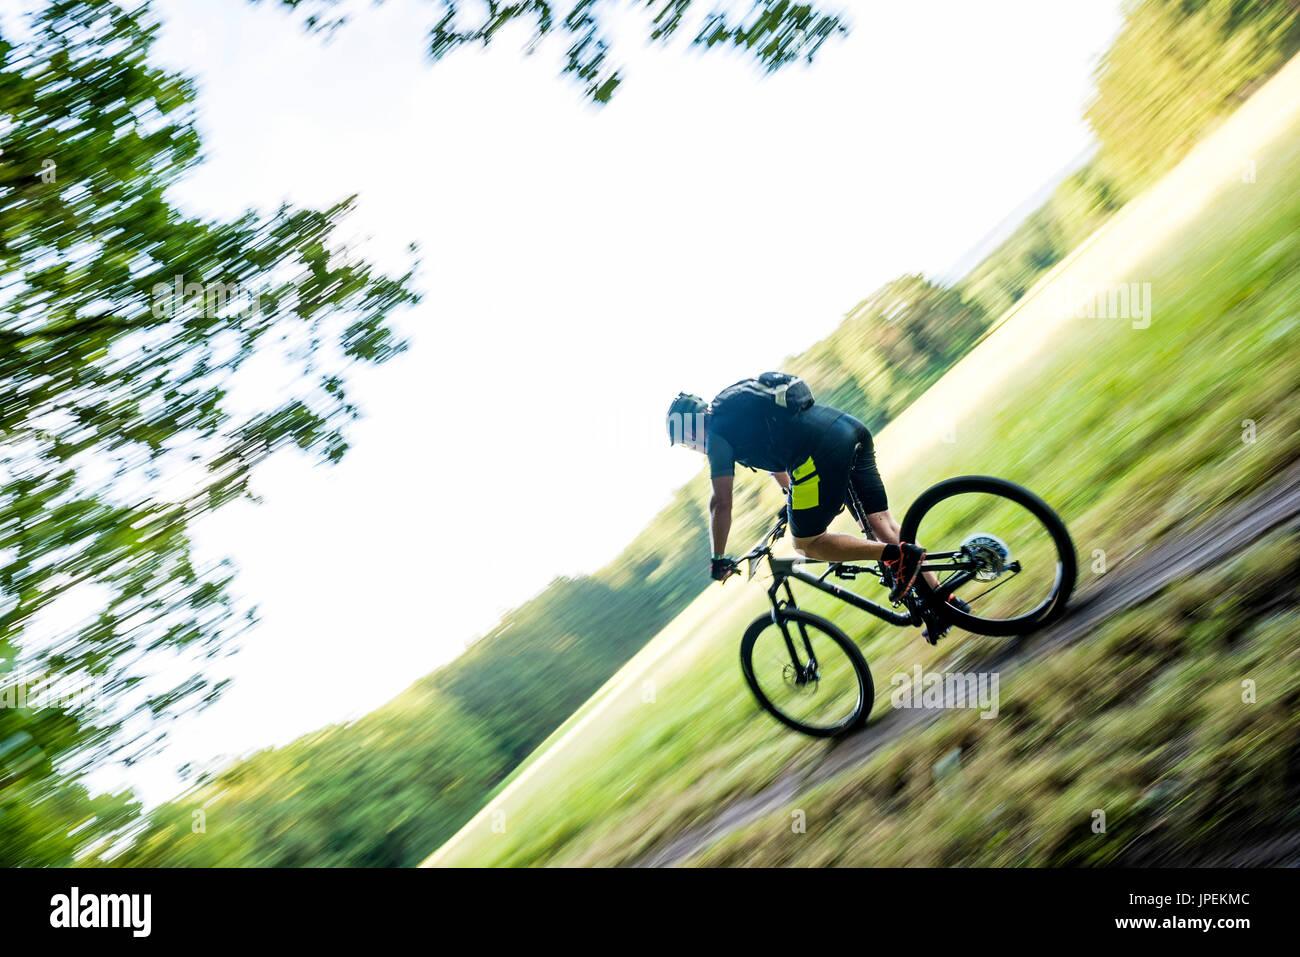 MTB Race Schatzberg Rennen - Diessen am Ammersee, Bavaria, Germany Stock Photo